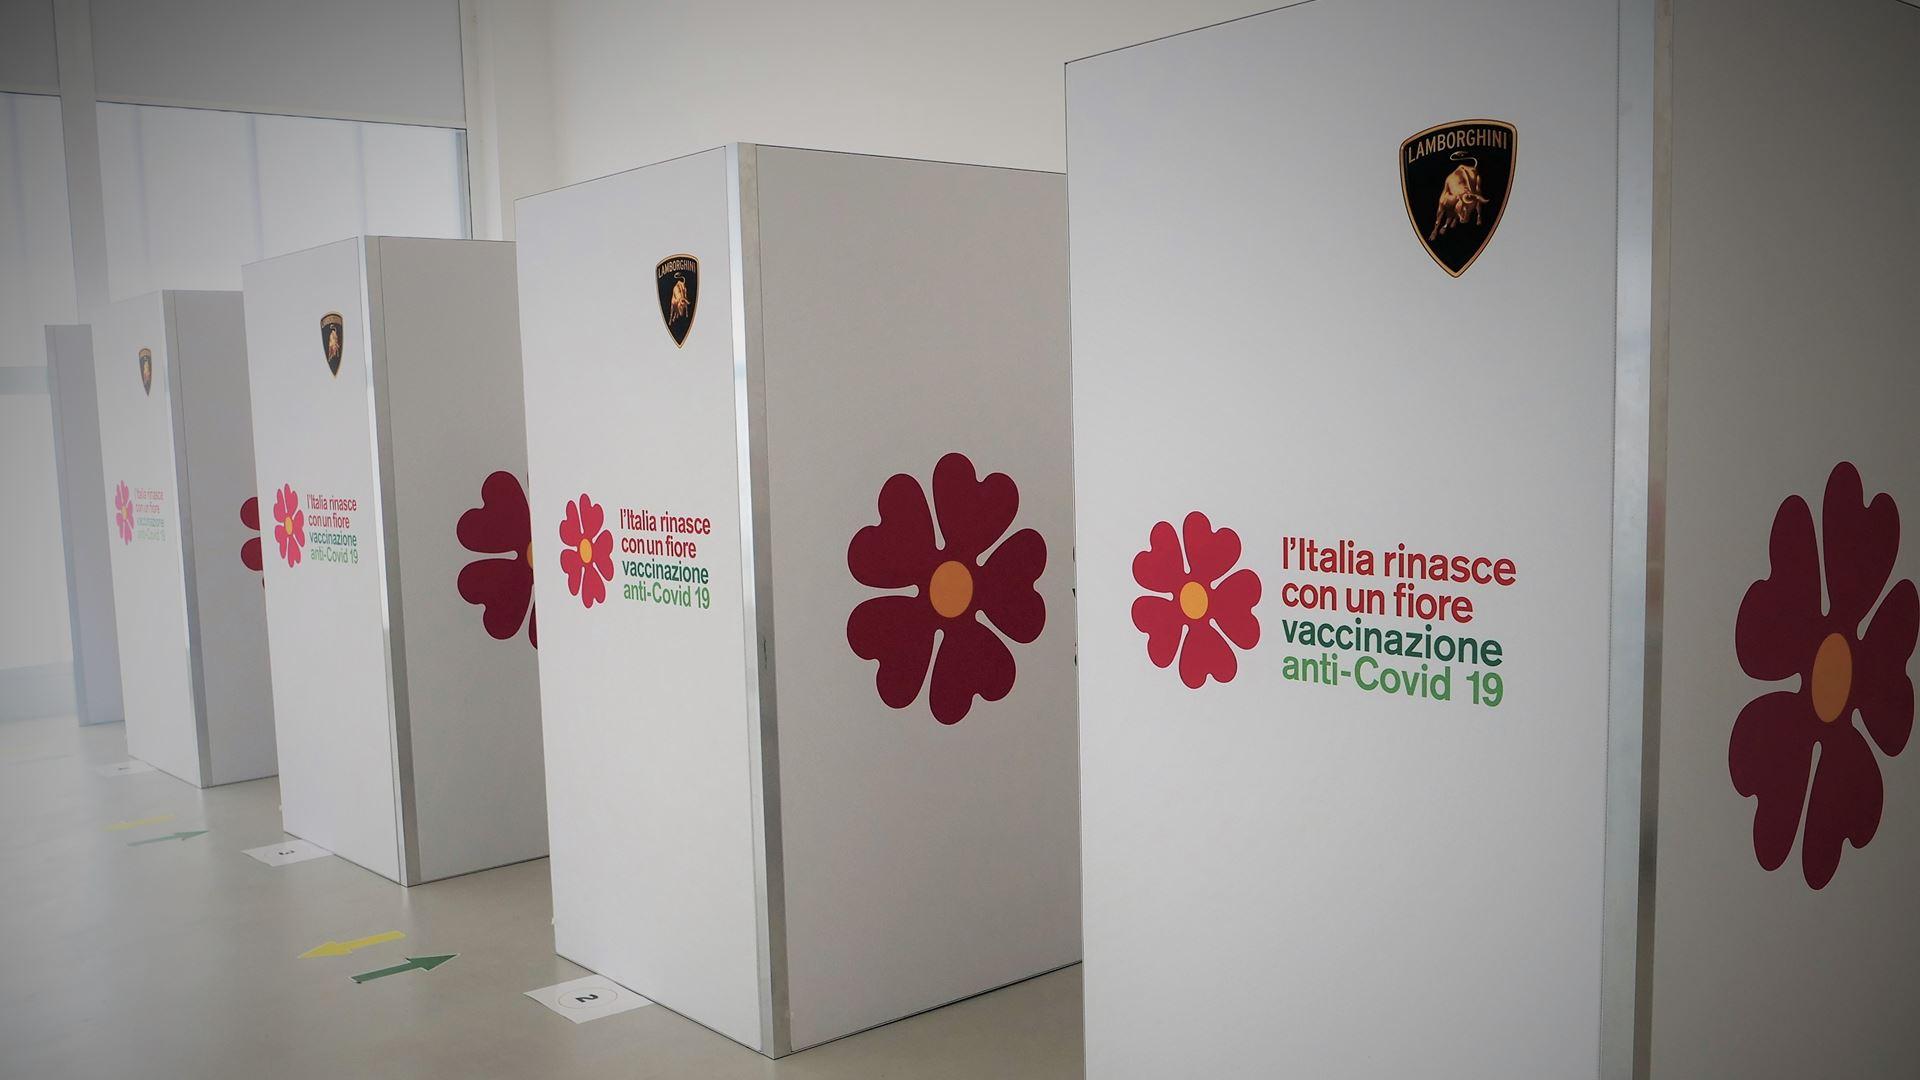 Automobili Lamborghini opens the company vaccination centre - All employees vaccinated in three day - Image 4